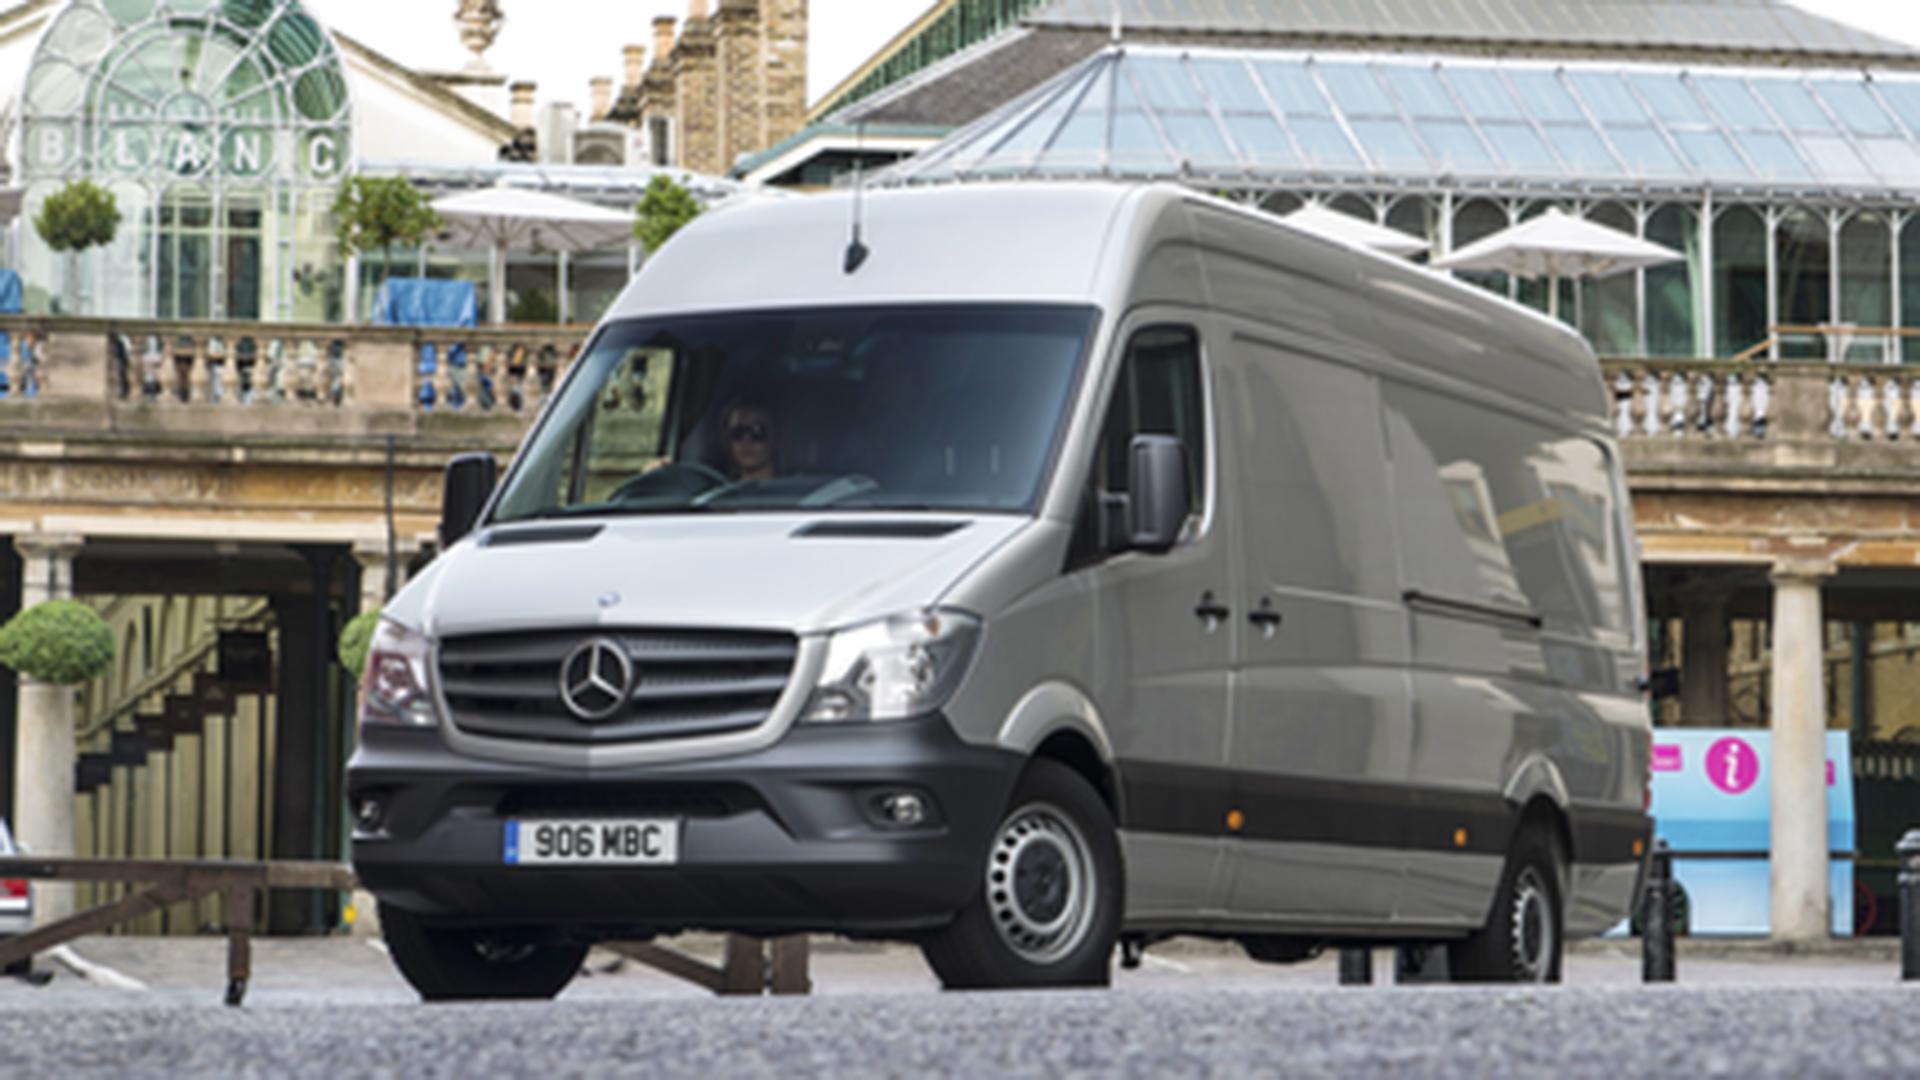 Used Mercedes Benz Sprinter Vans For Sale Auto Trader Vans